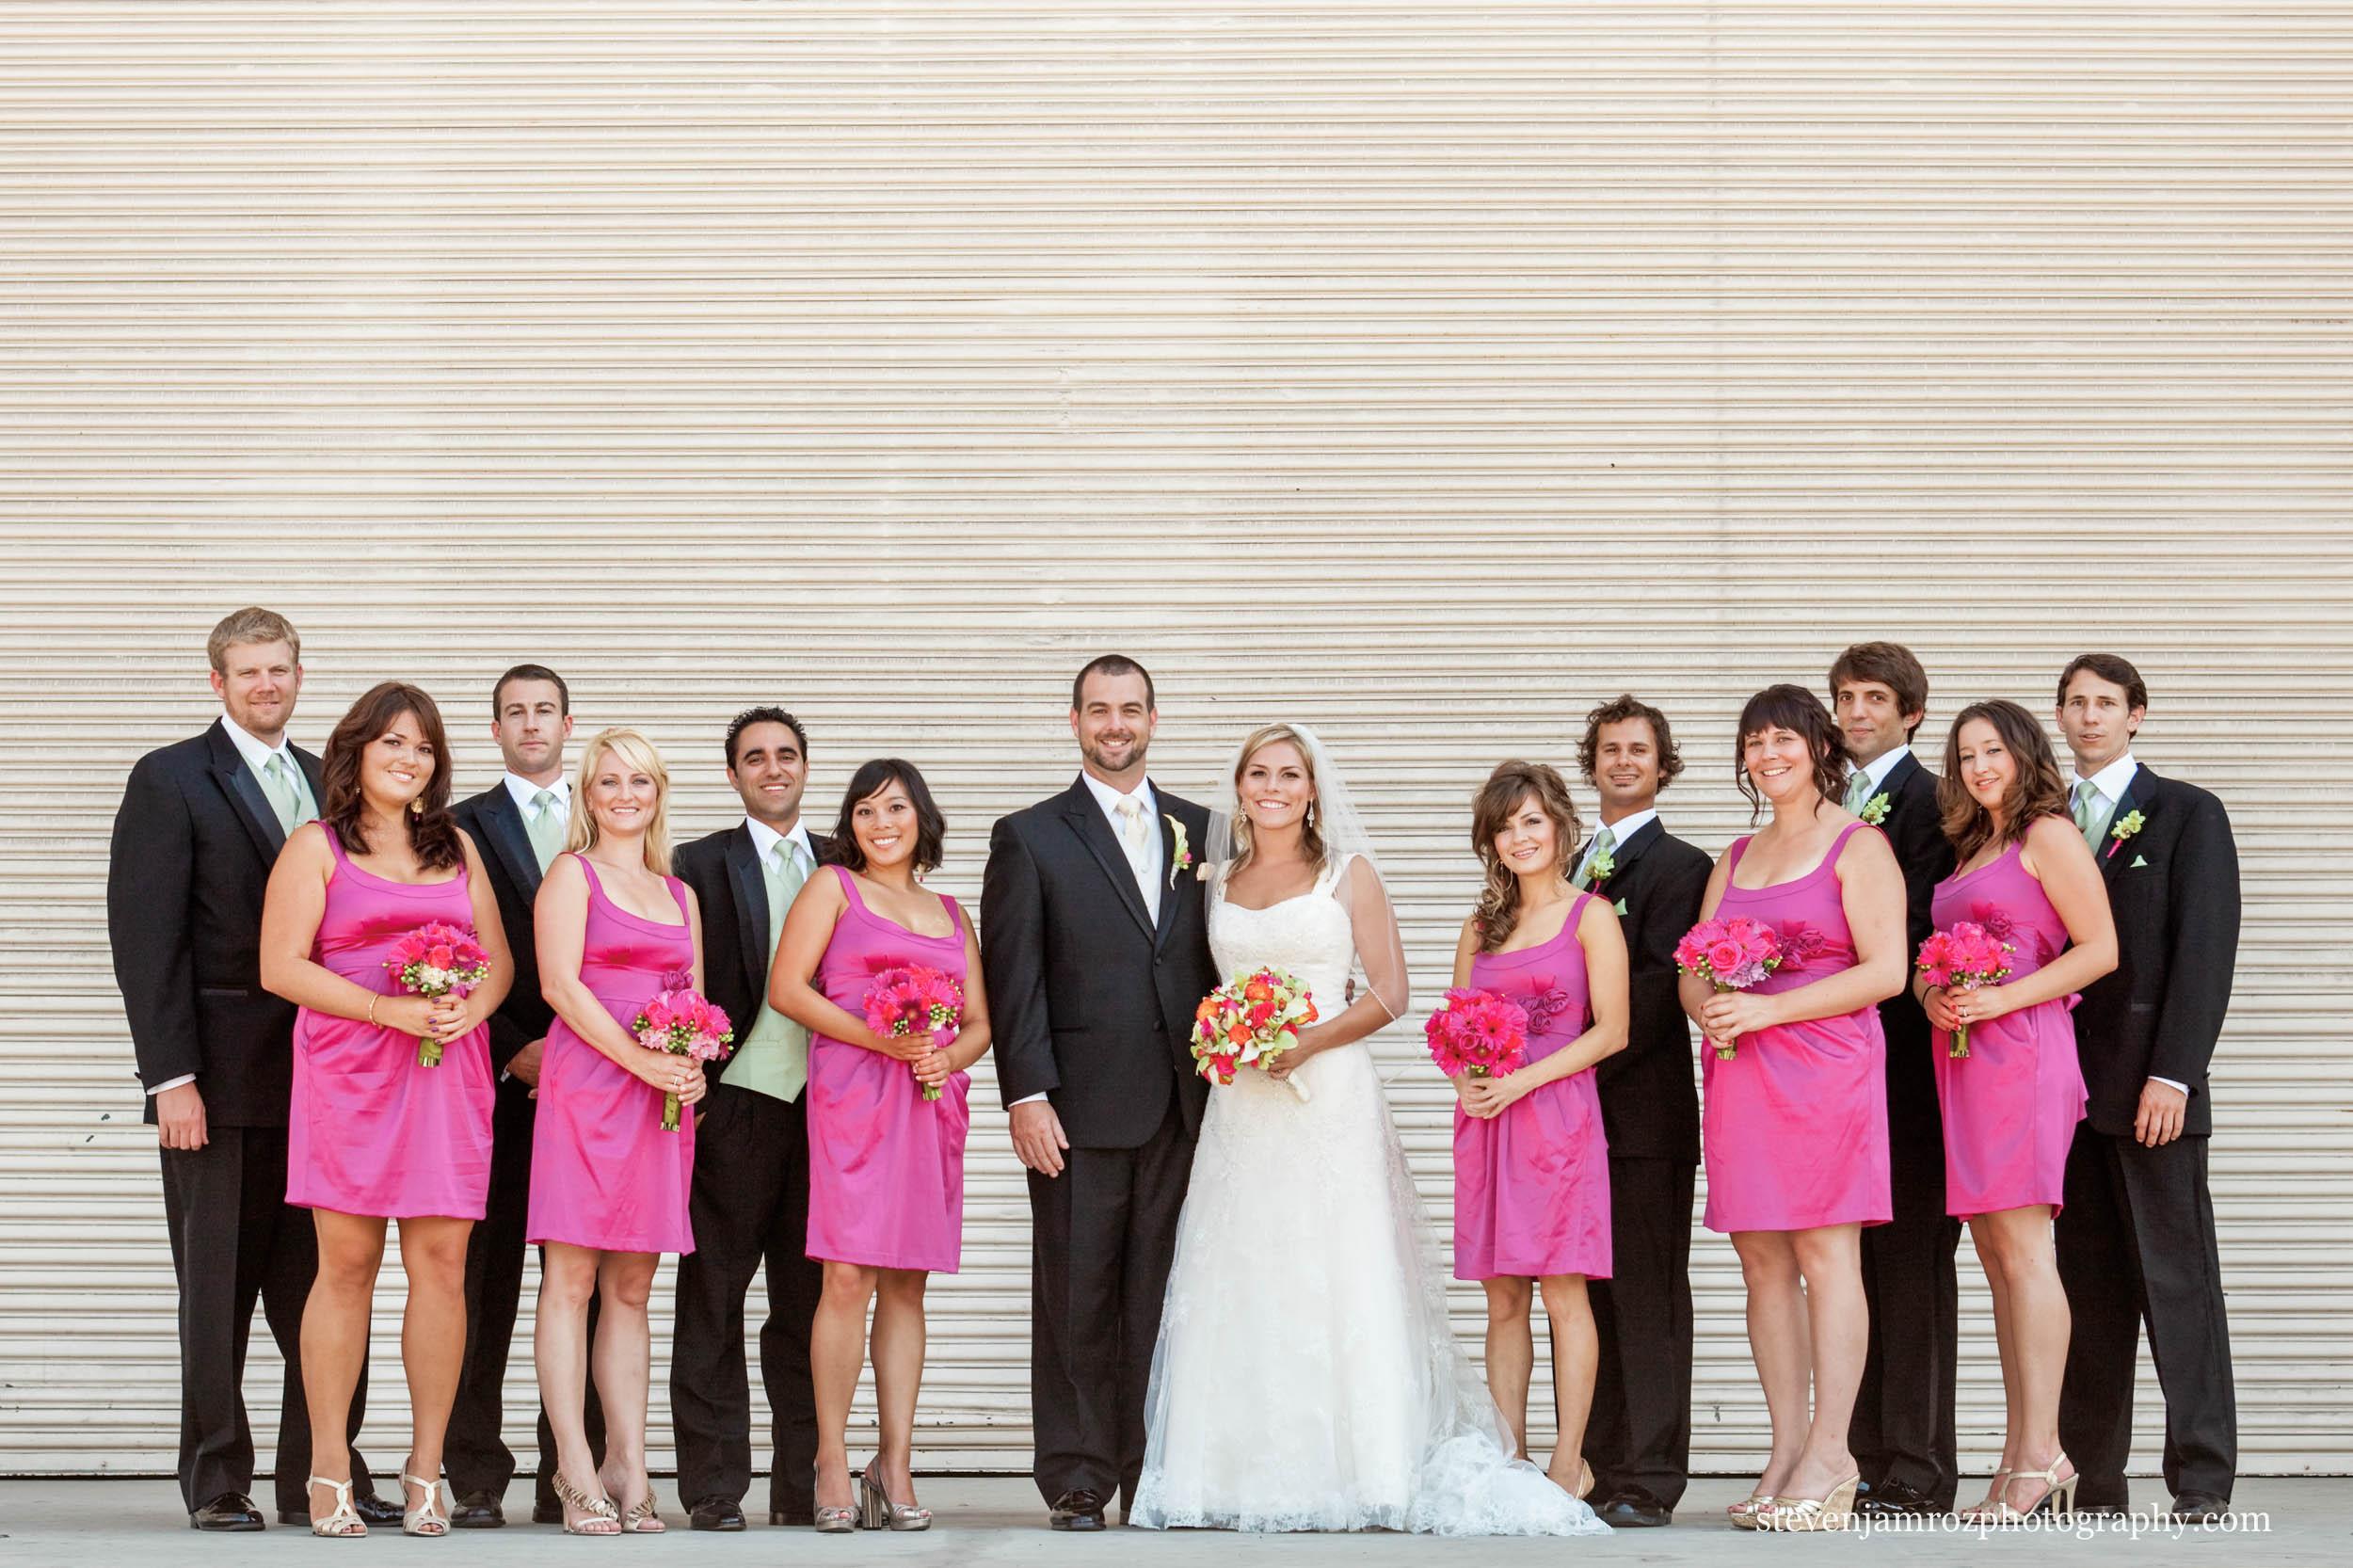 apex-nc-bridal-party-photo-wedding-steven-jamroz-photography-0631.jpg